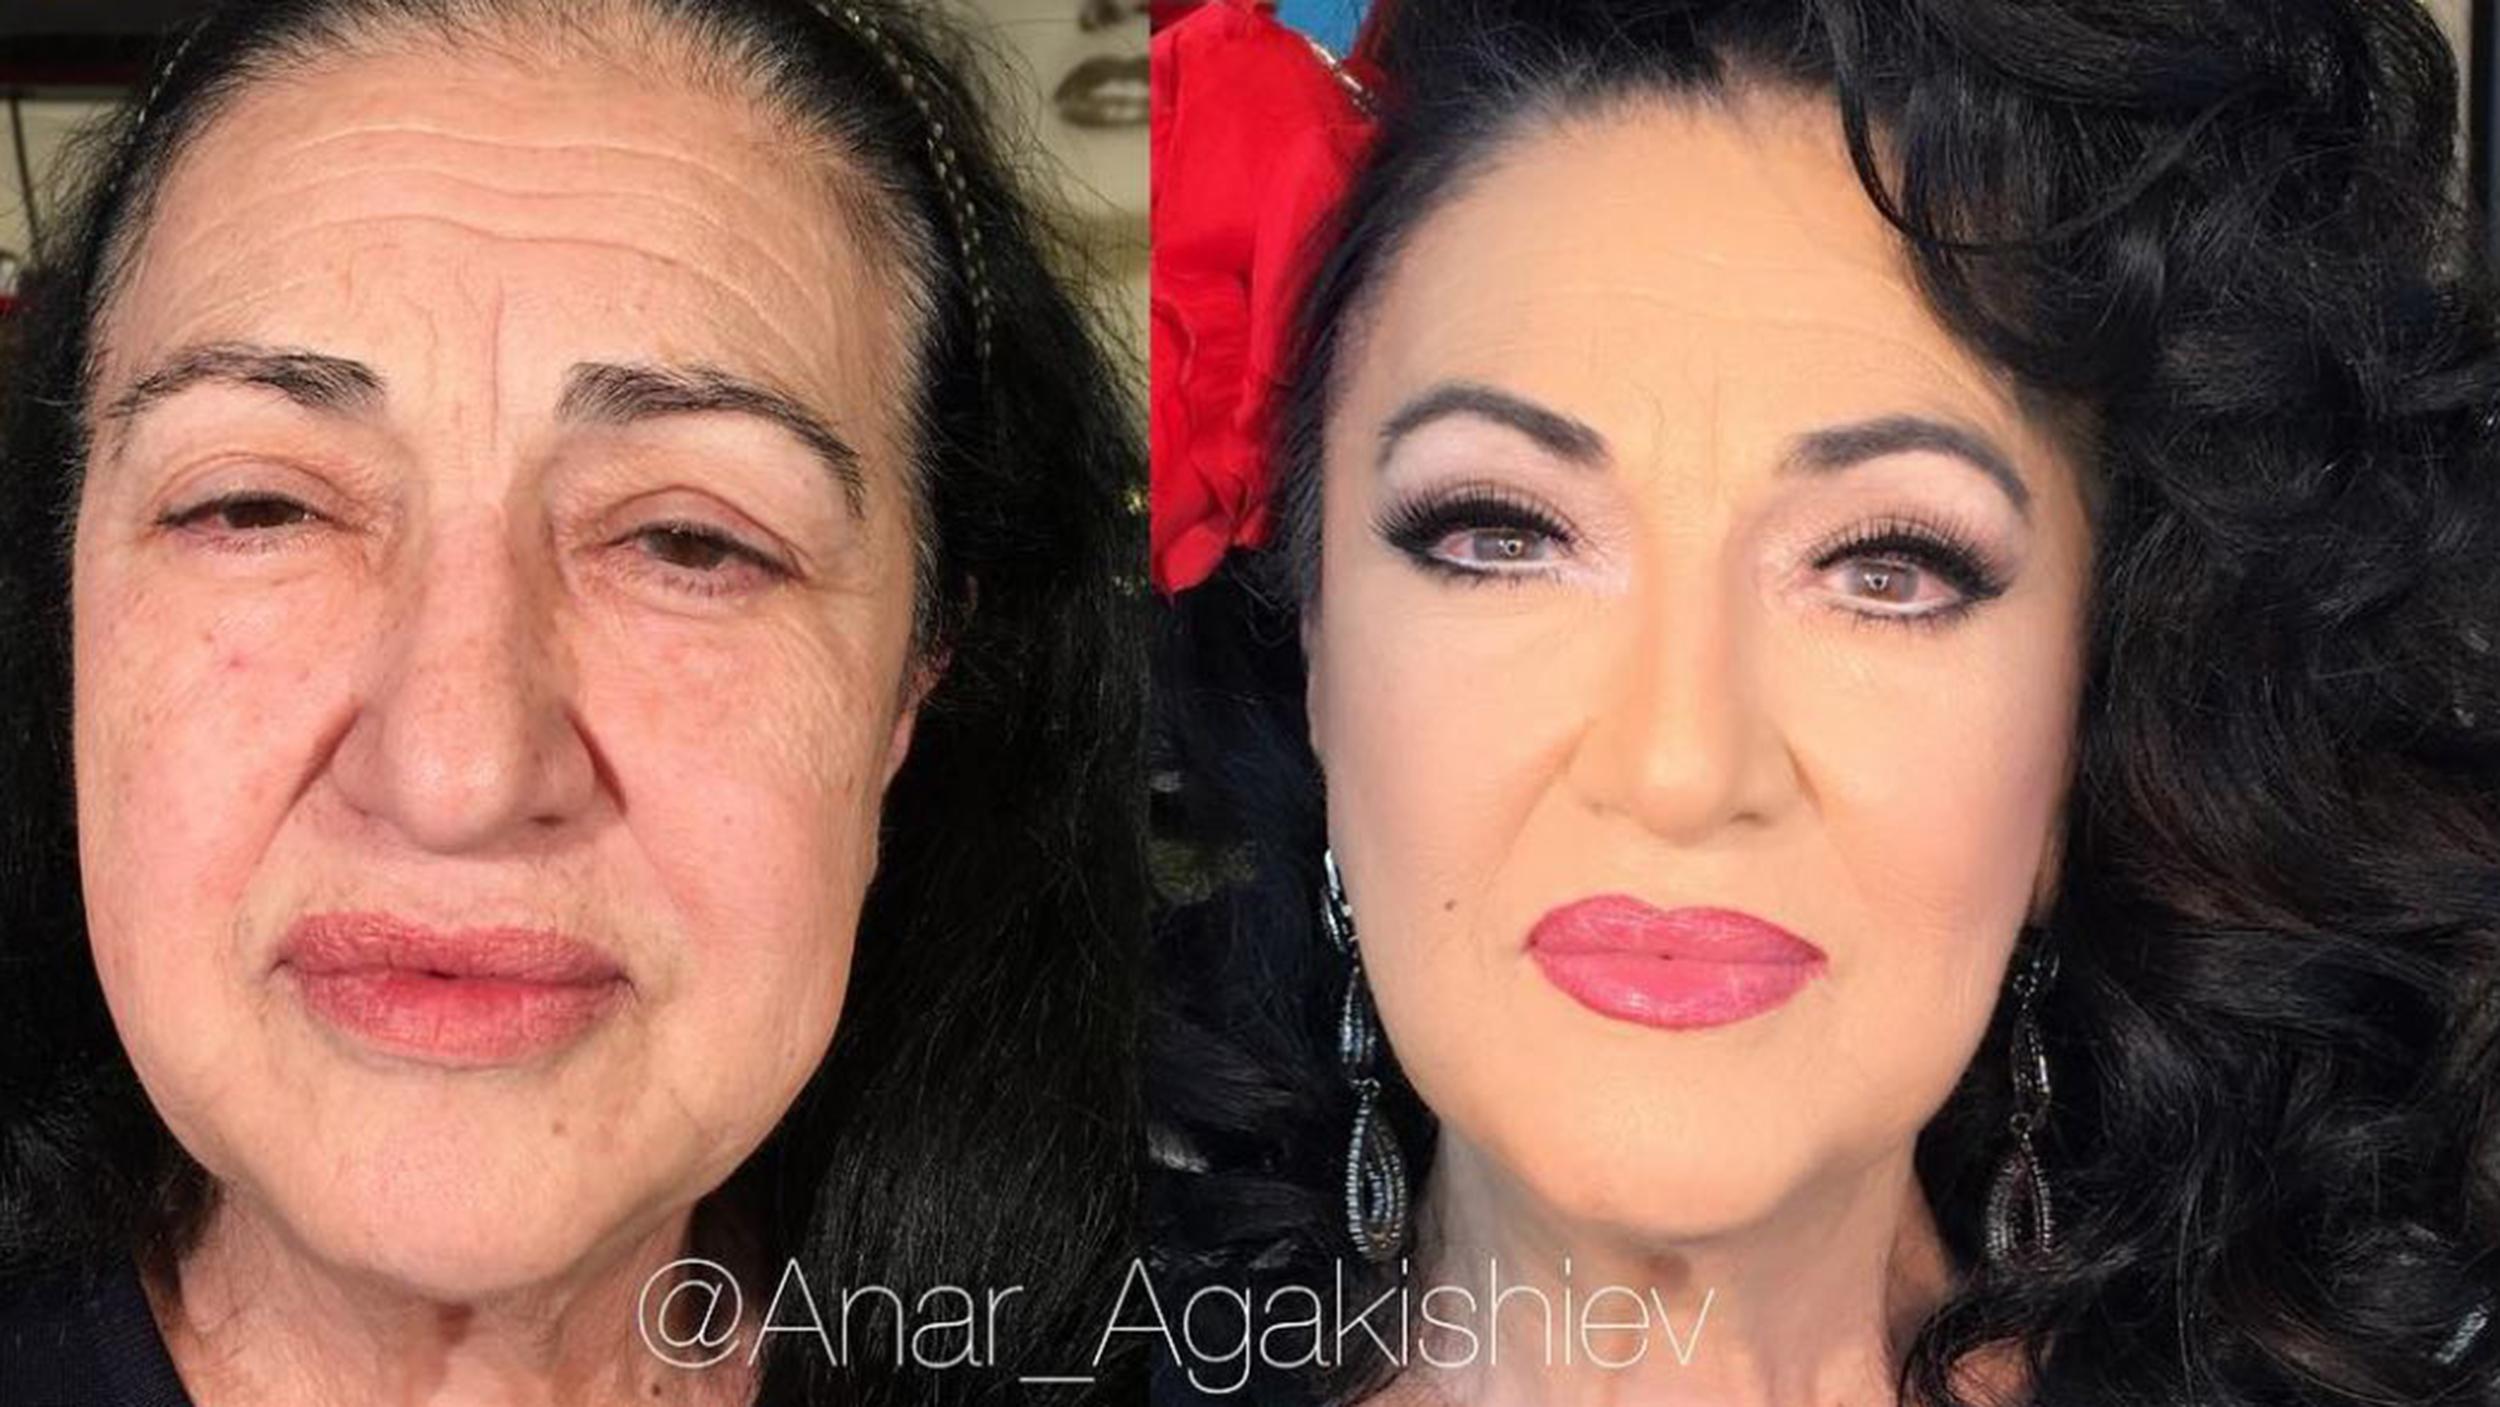 Makeup artist anar agakishiev does amazing transformations of women makeup artist anar agakishiev does amazing transformations of women 45 and up publicscrutiny Choice Image